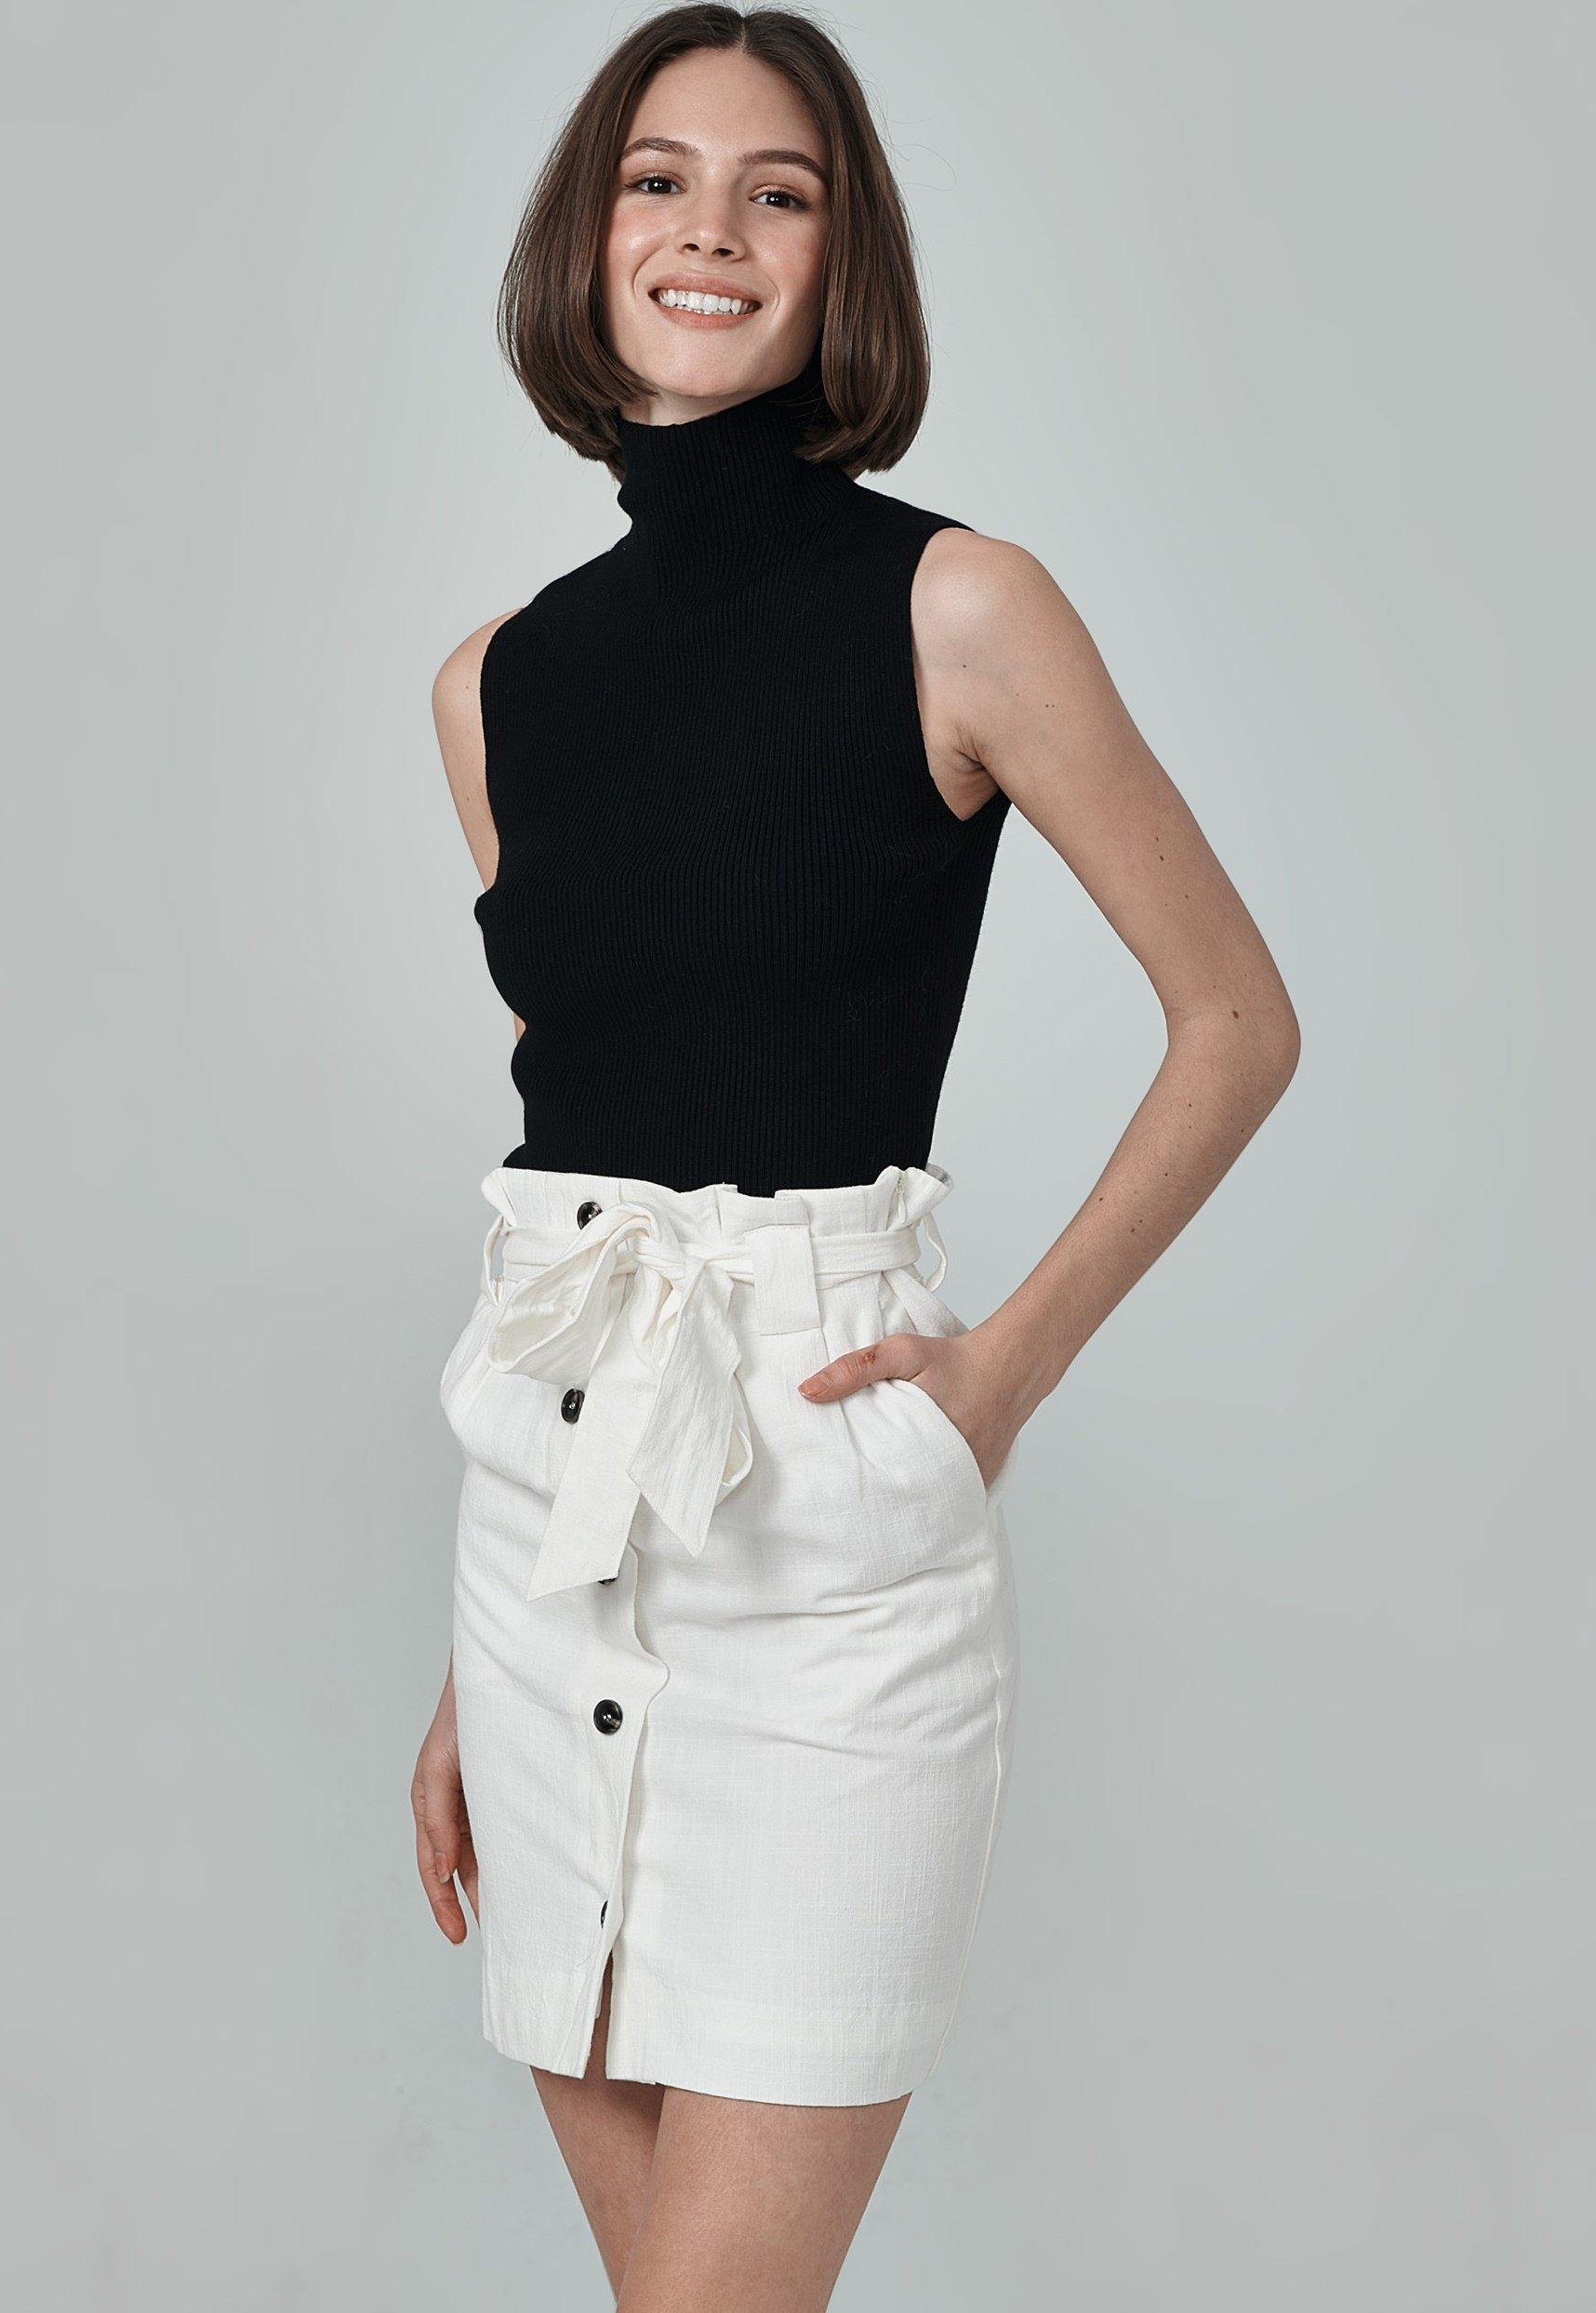 Mujer LAS VEGAS - Minifalda